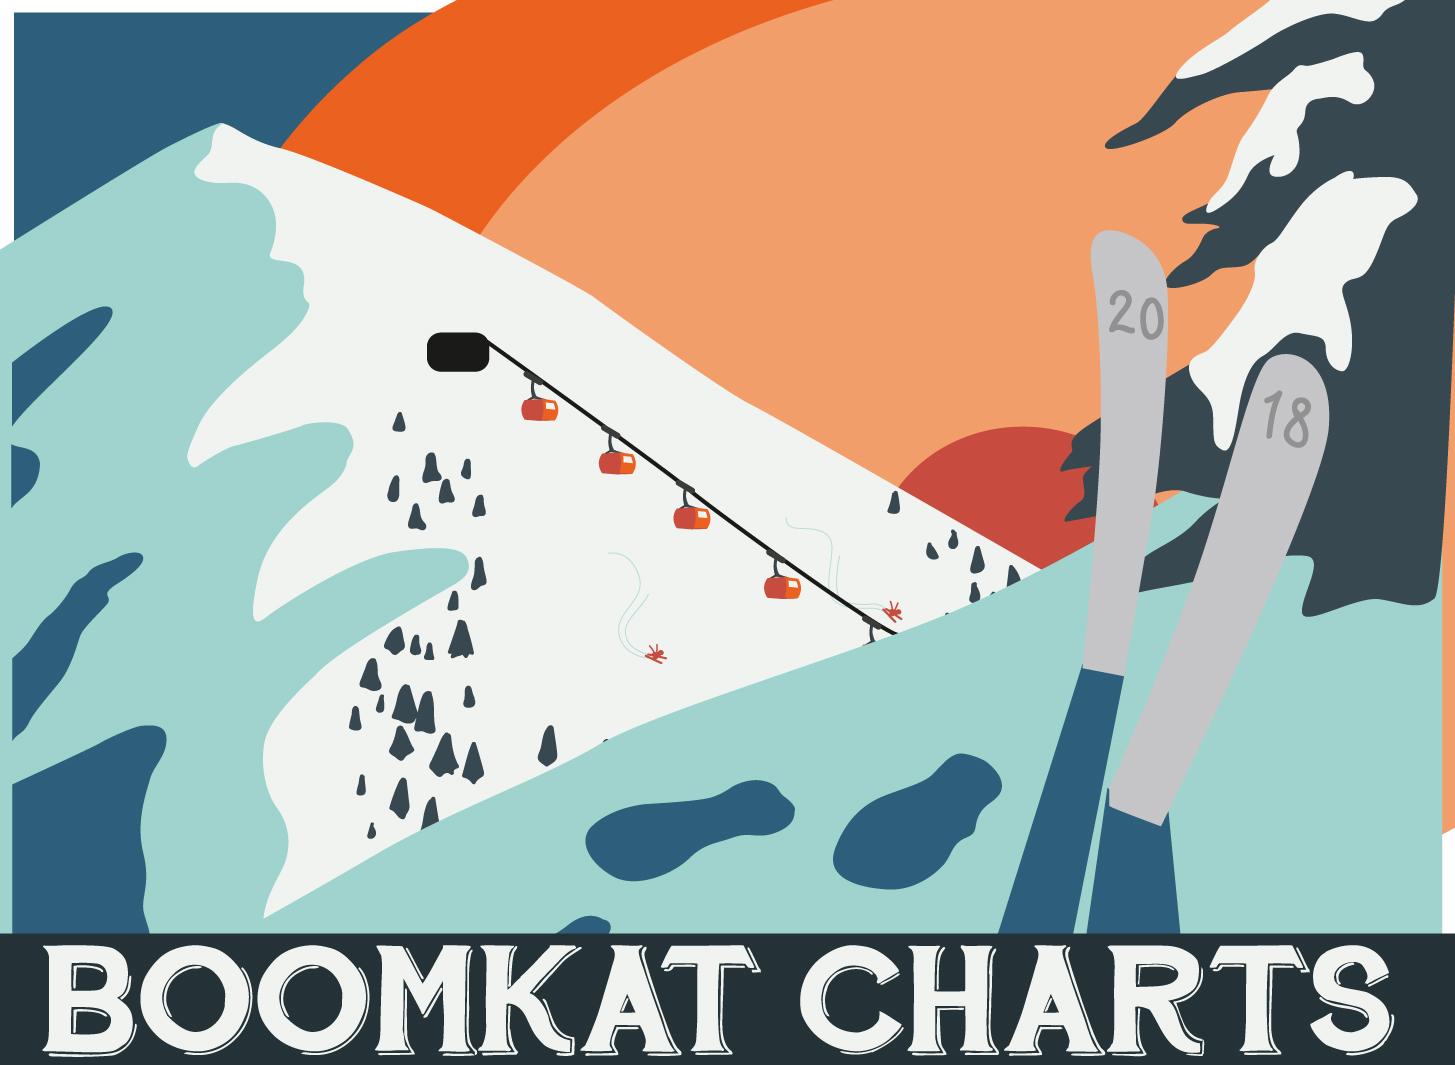 00 main charts 2018 01 large panel